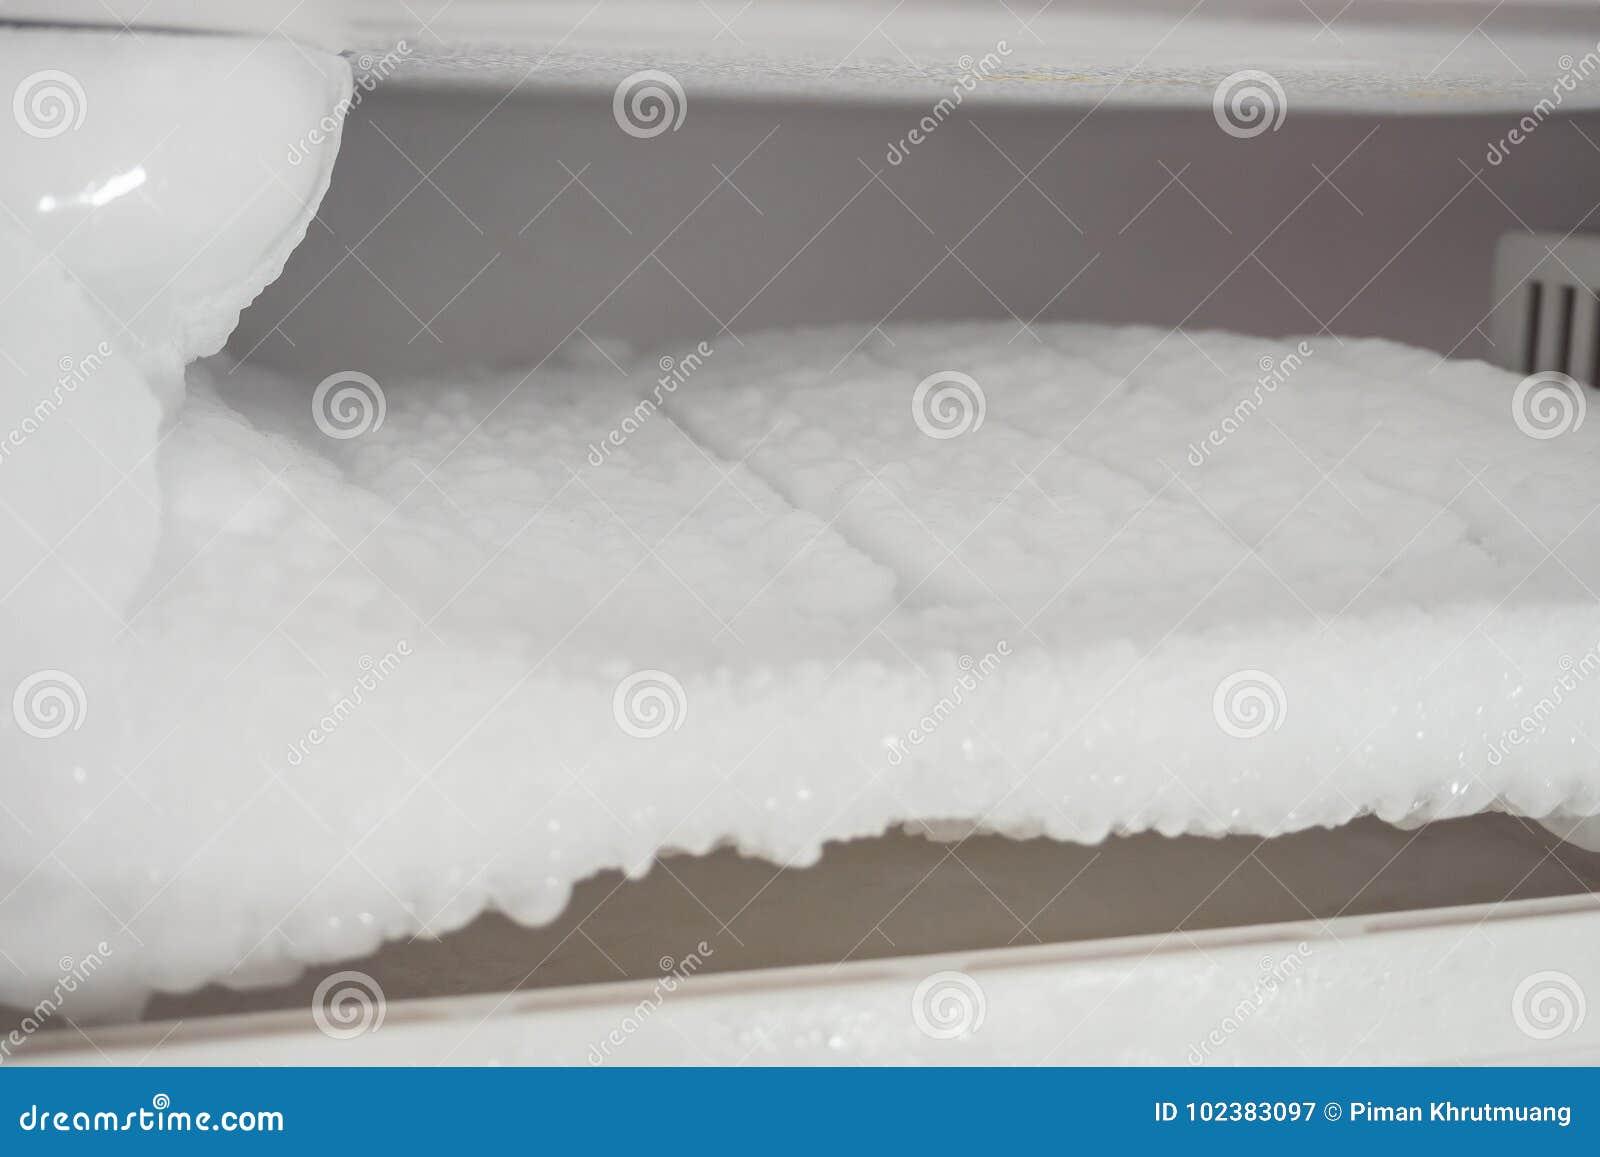 The freezer of refrigerator